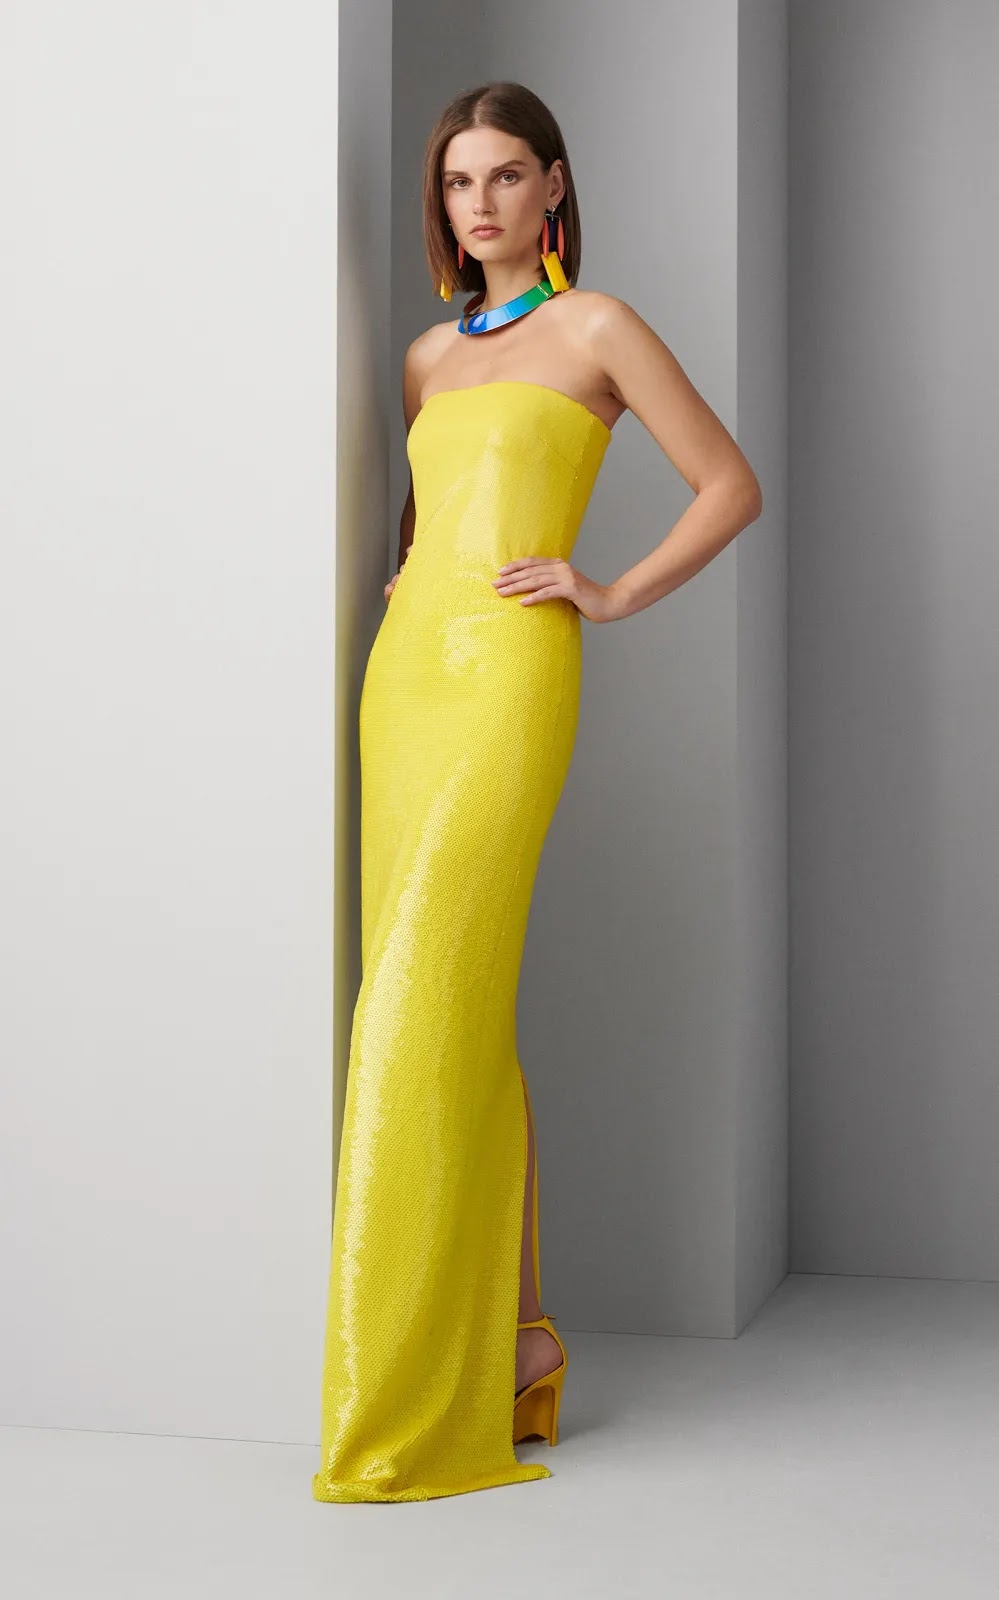 17 Kreativ Moderne Abendkleidung VertriebAbend Einzigartig Moderne Abendkleidung Stylish